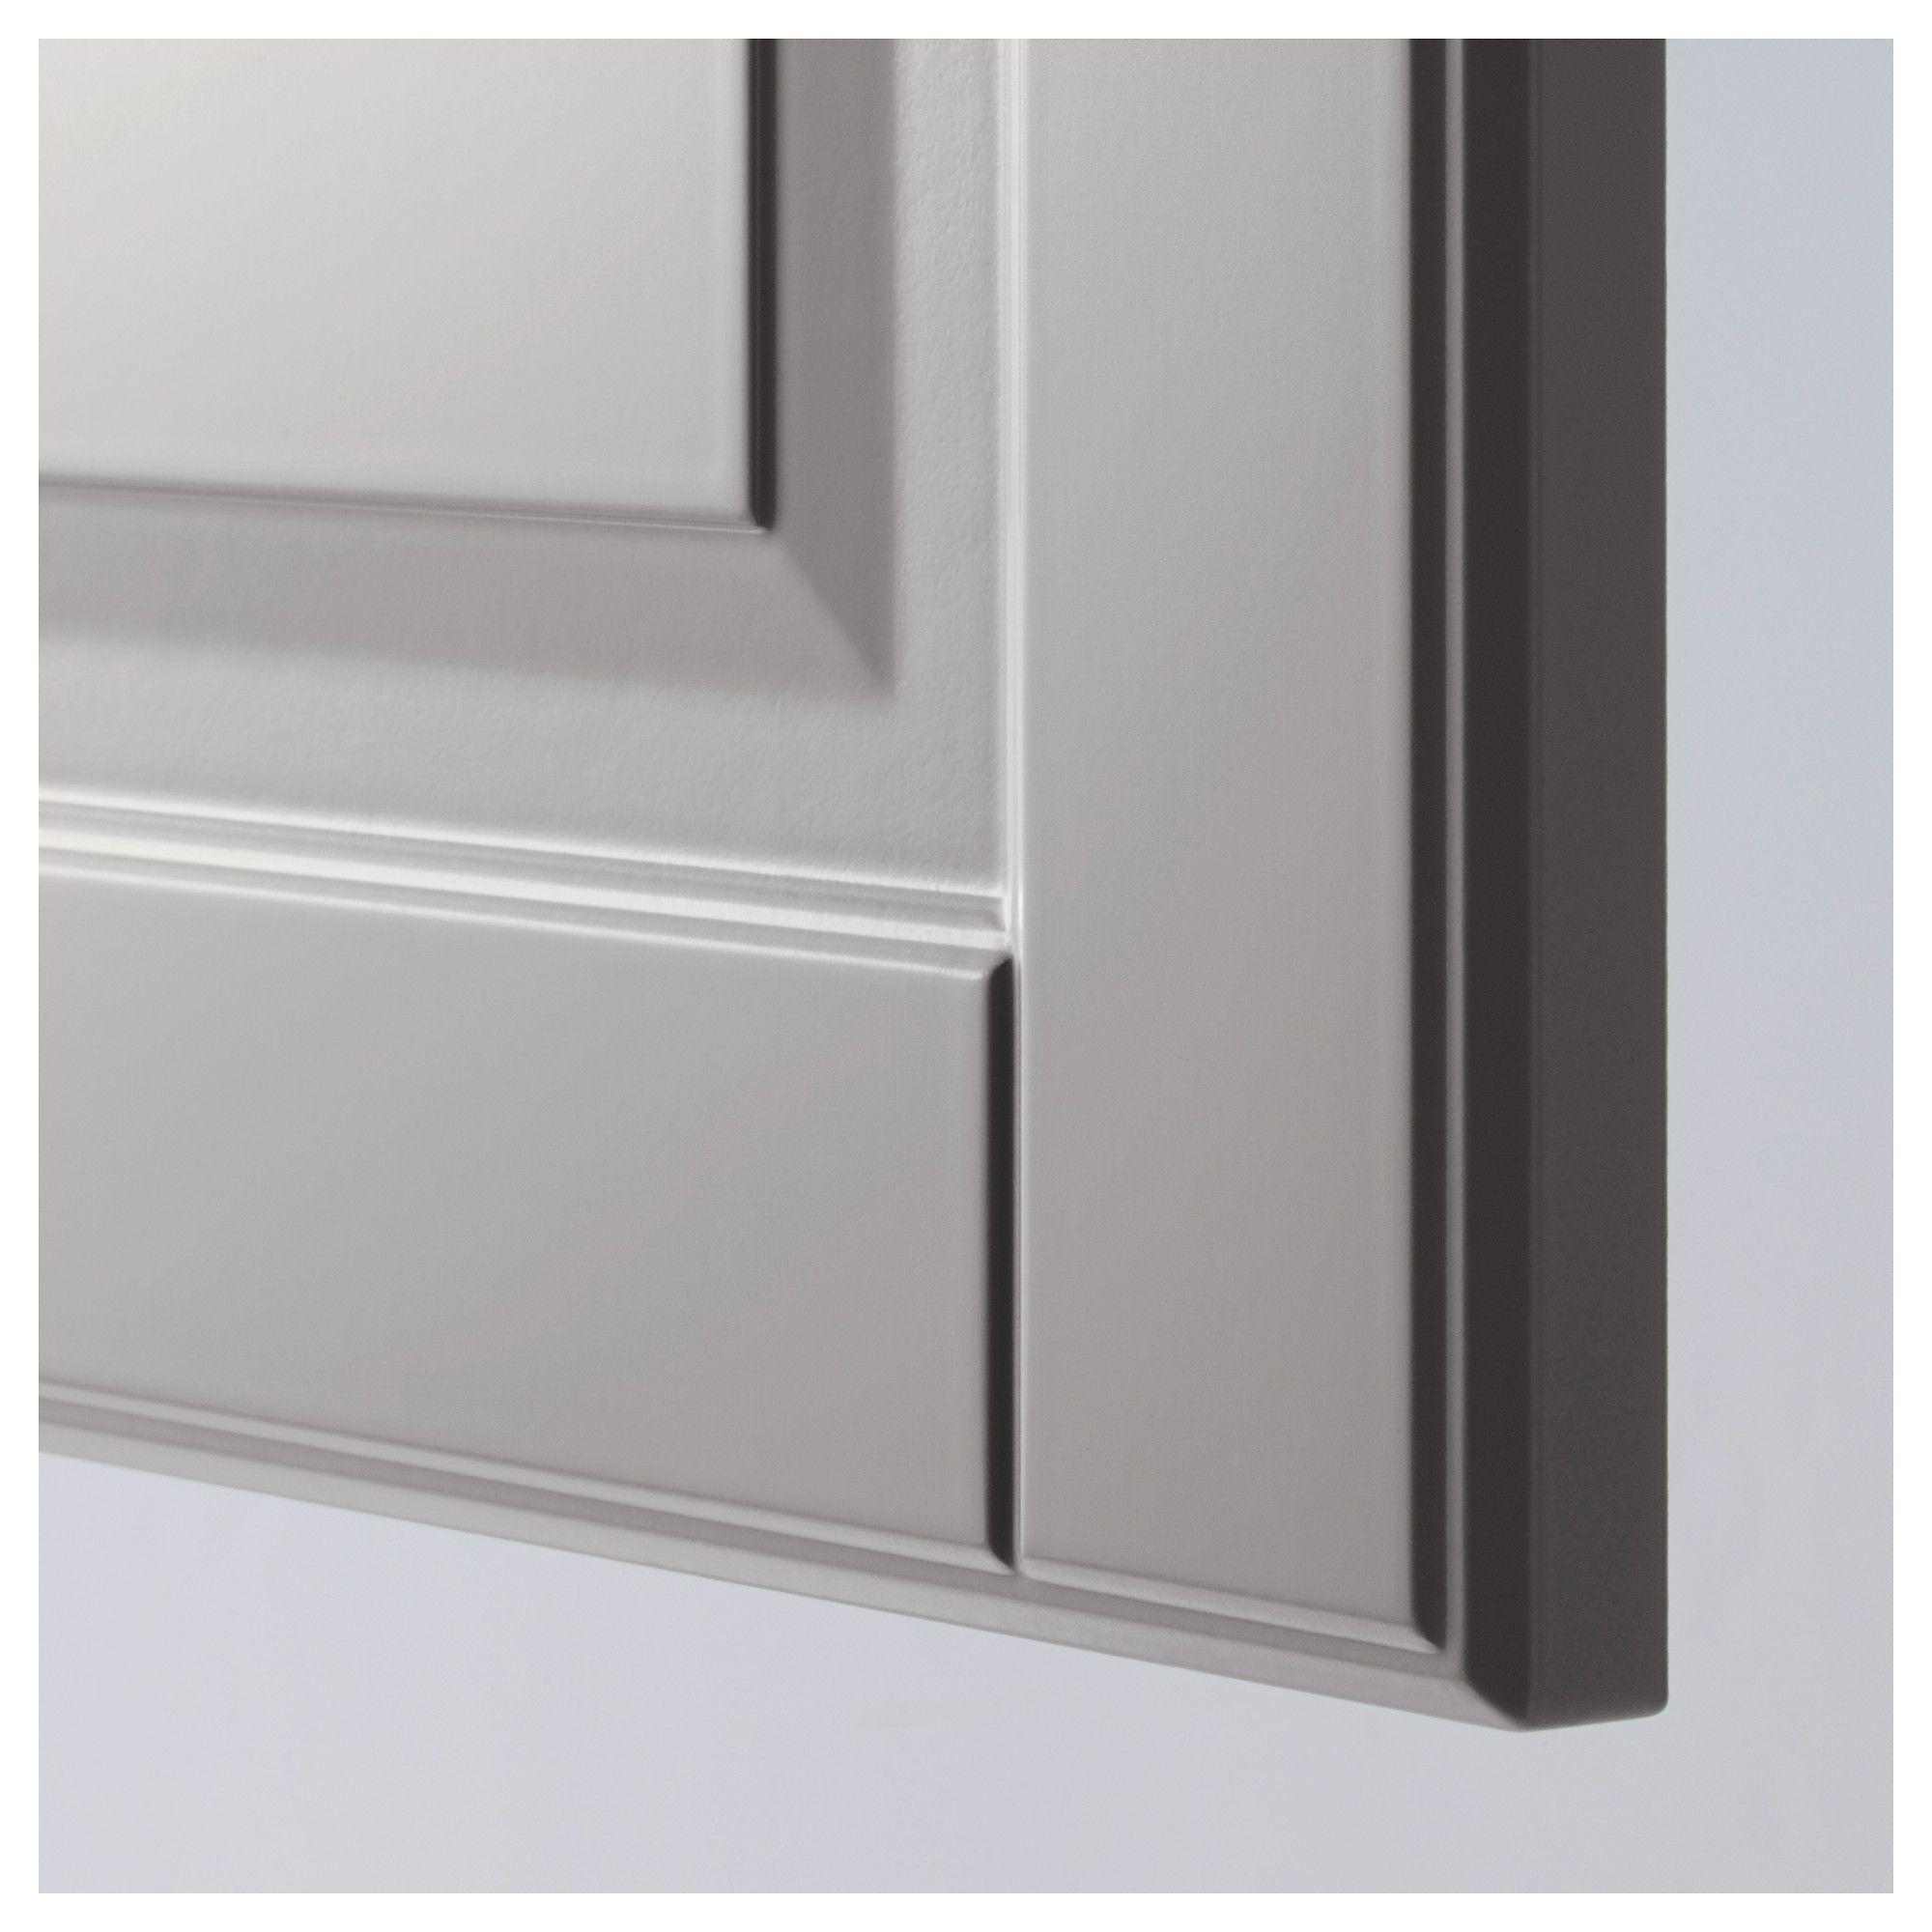 BODBYN ????? - IKEA & BODBYN ????? - IKEA | ikea furniture | Pinterest | Bodbyn grey and ...